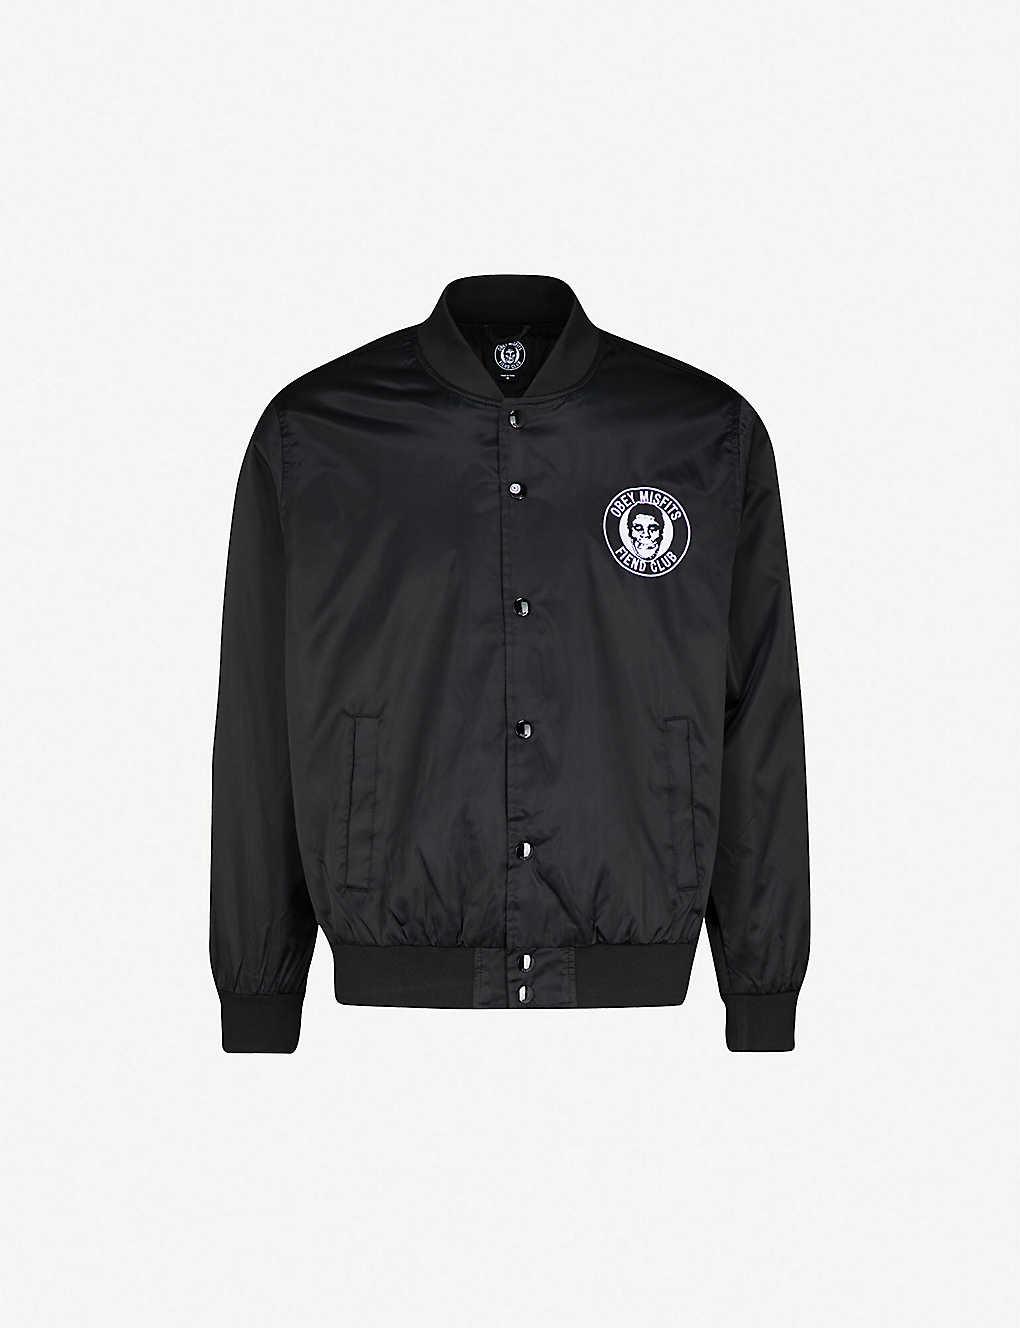 ce2f4abb5 OBEY - OBEY x Misfits Fiend Club patch satin-shell jacket ...